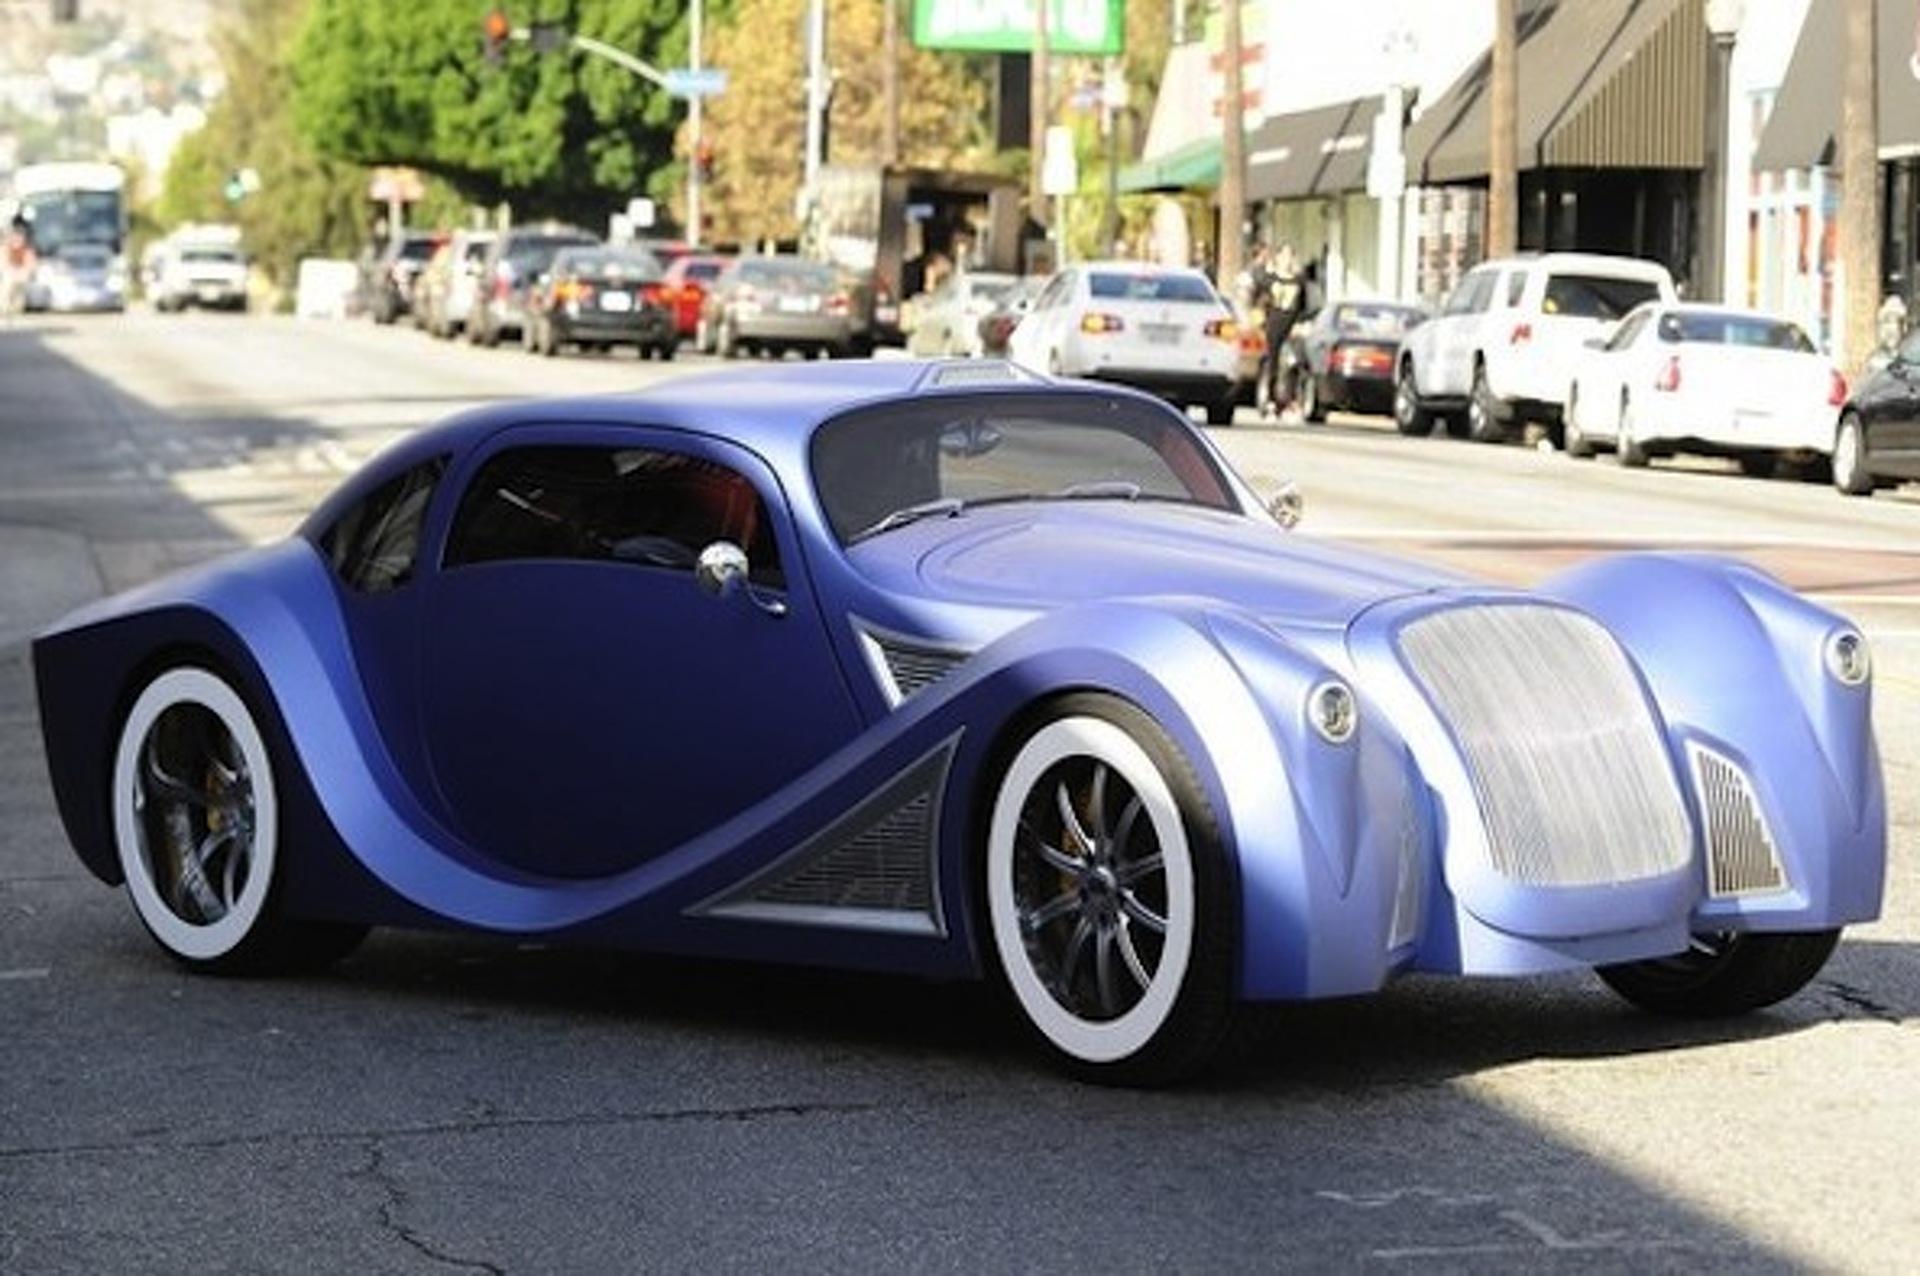 Will.I.Am Hits Hollywood in his Insane $900,000 Custom Car